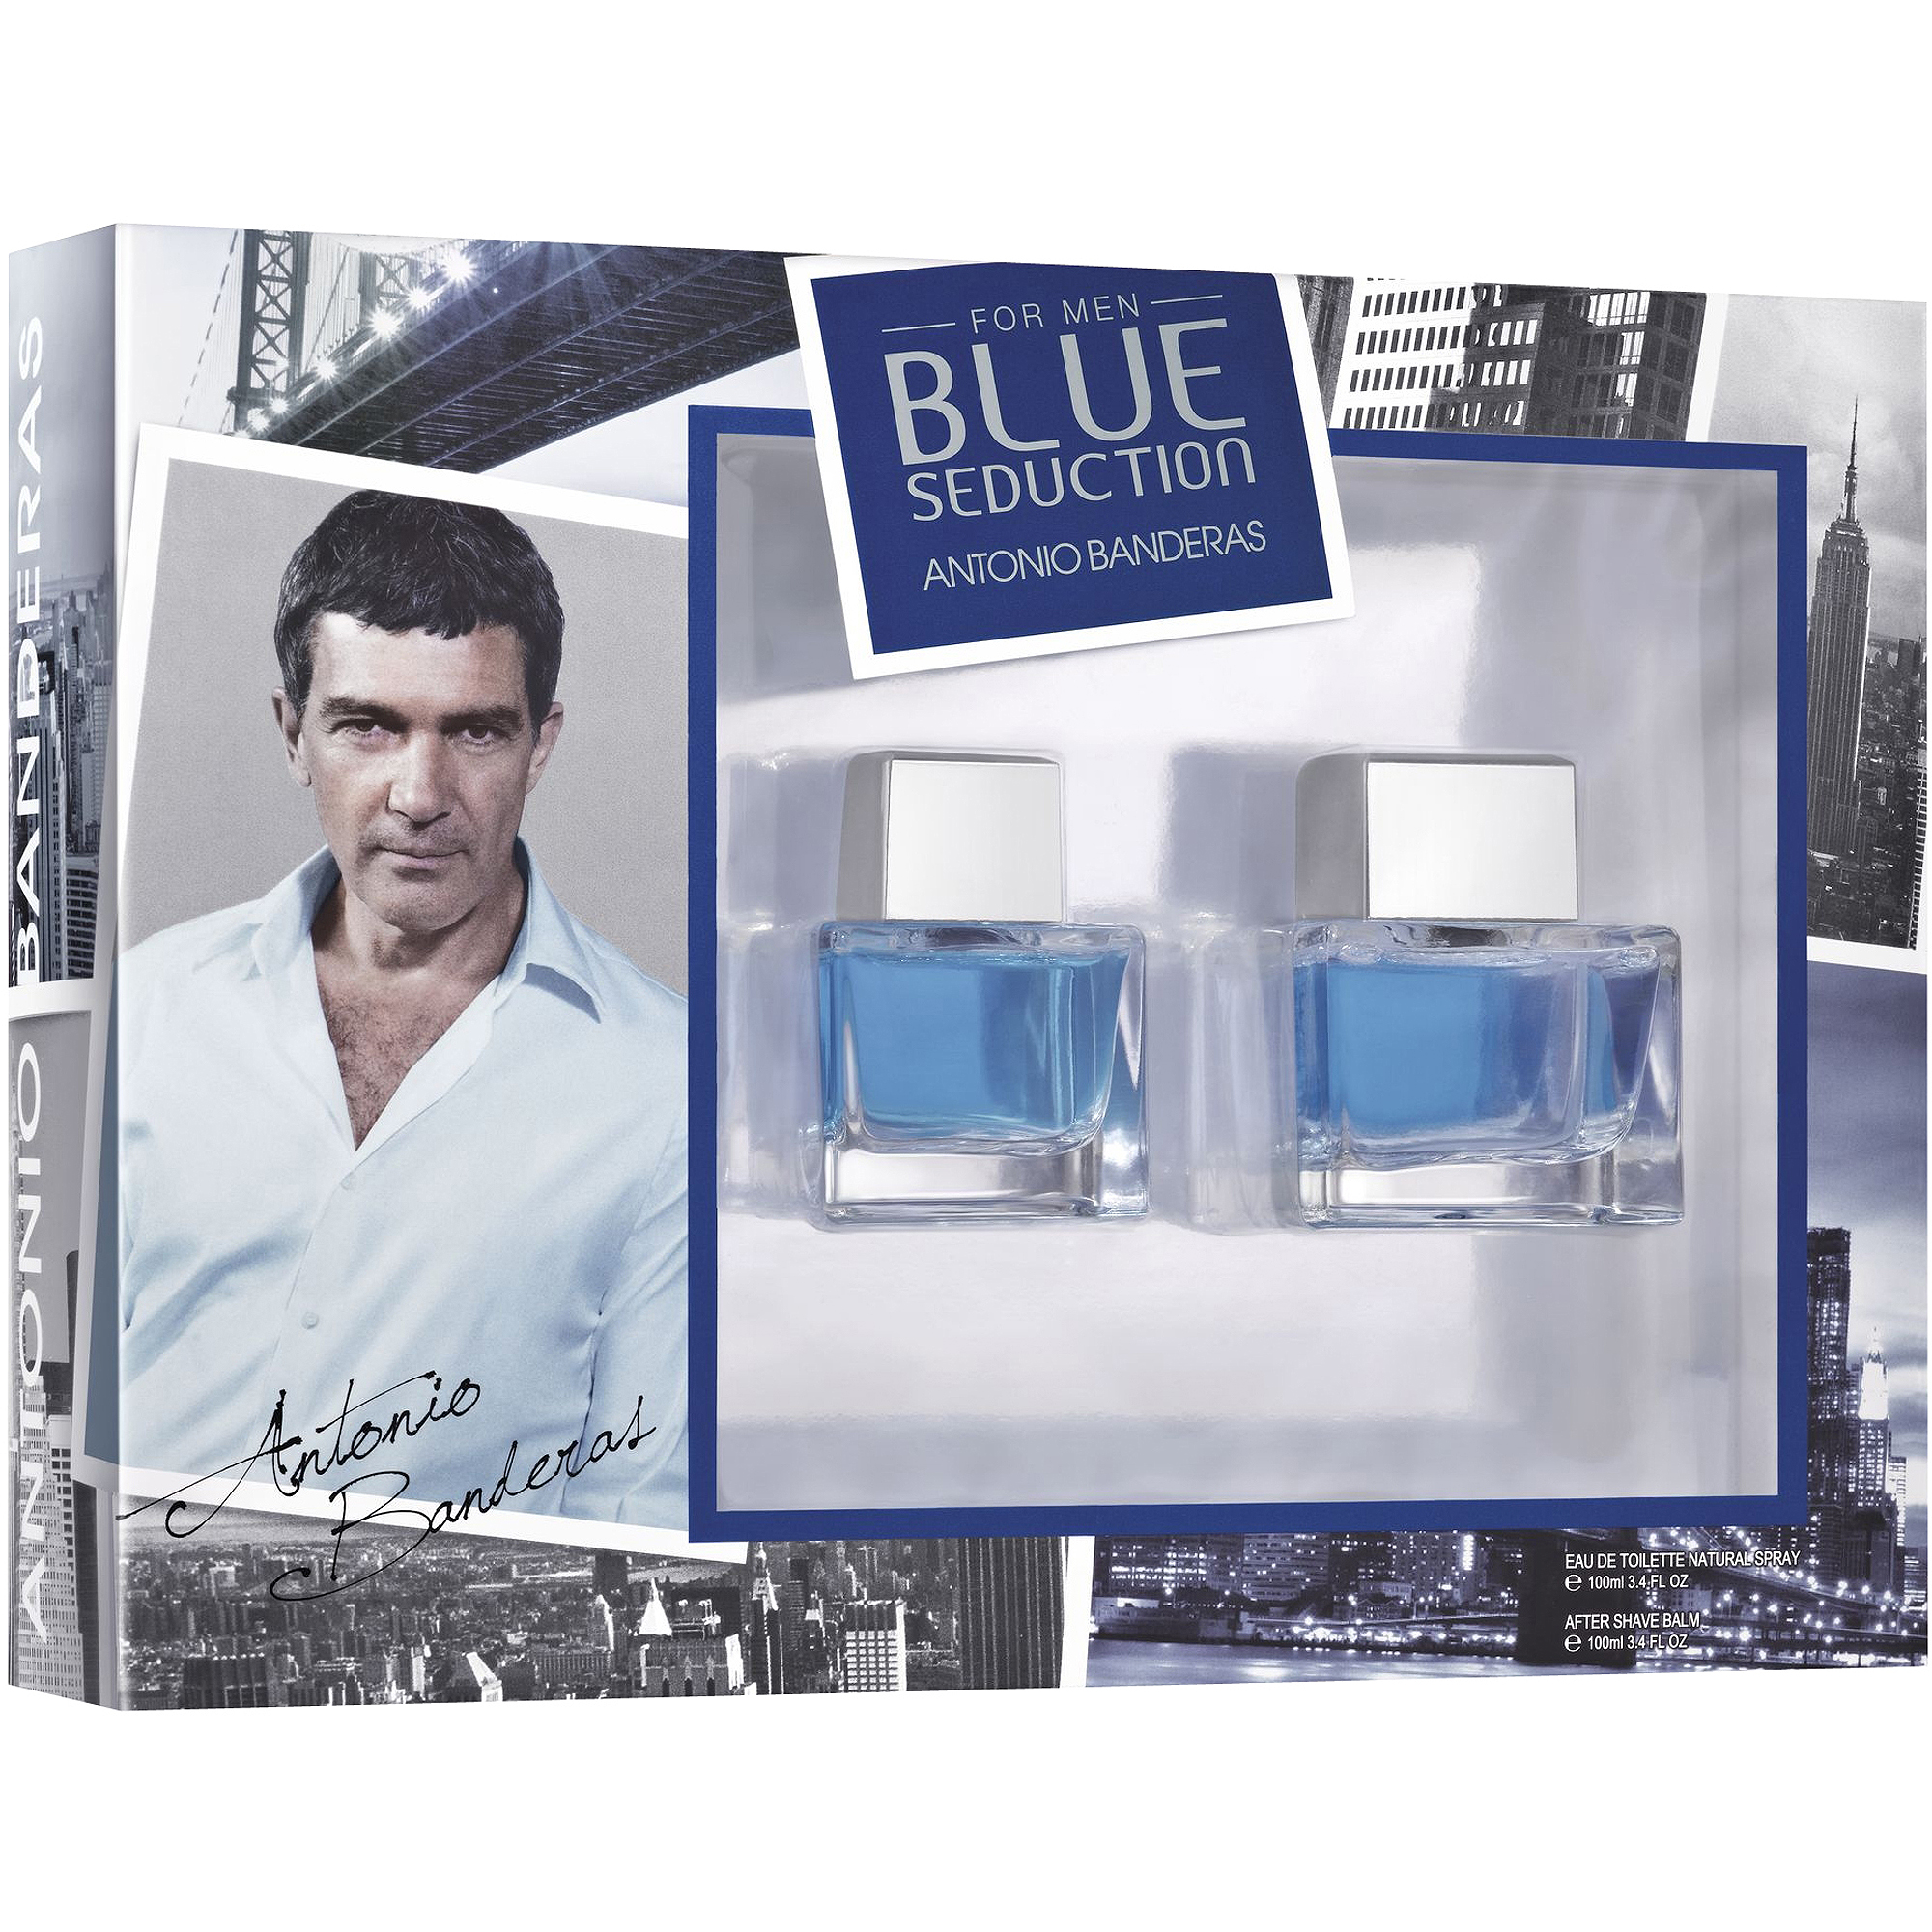 Antonio Banderas for Men Blue Seduction Fragrance Gift Set, 2 pc